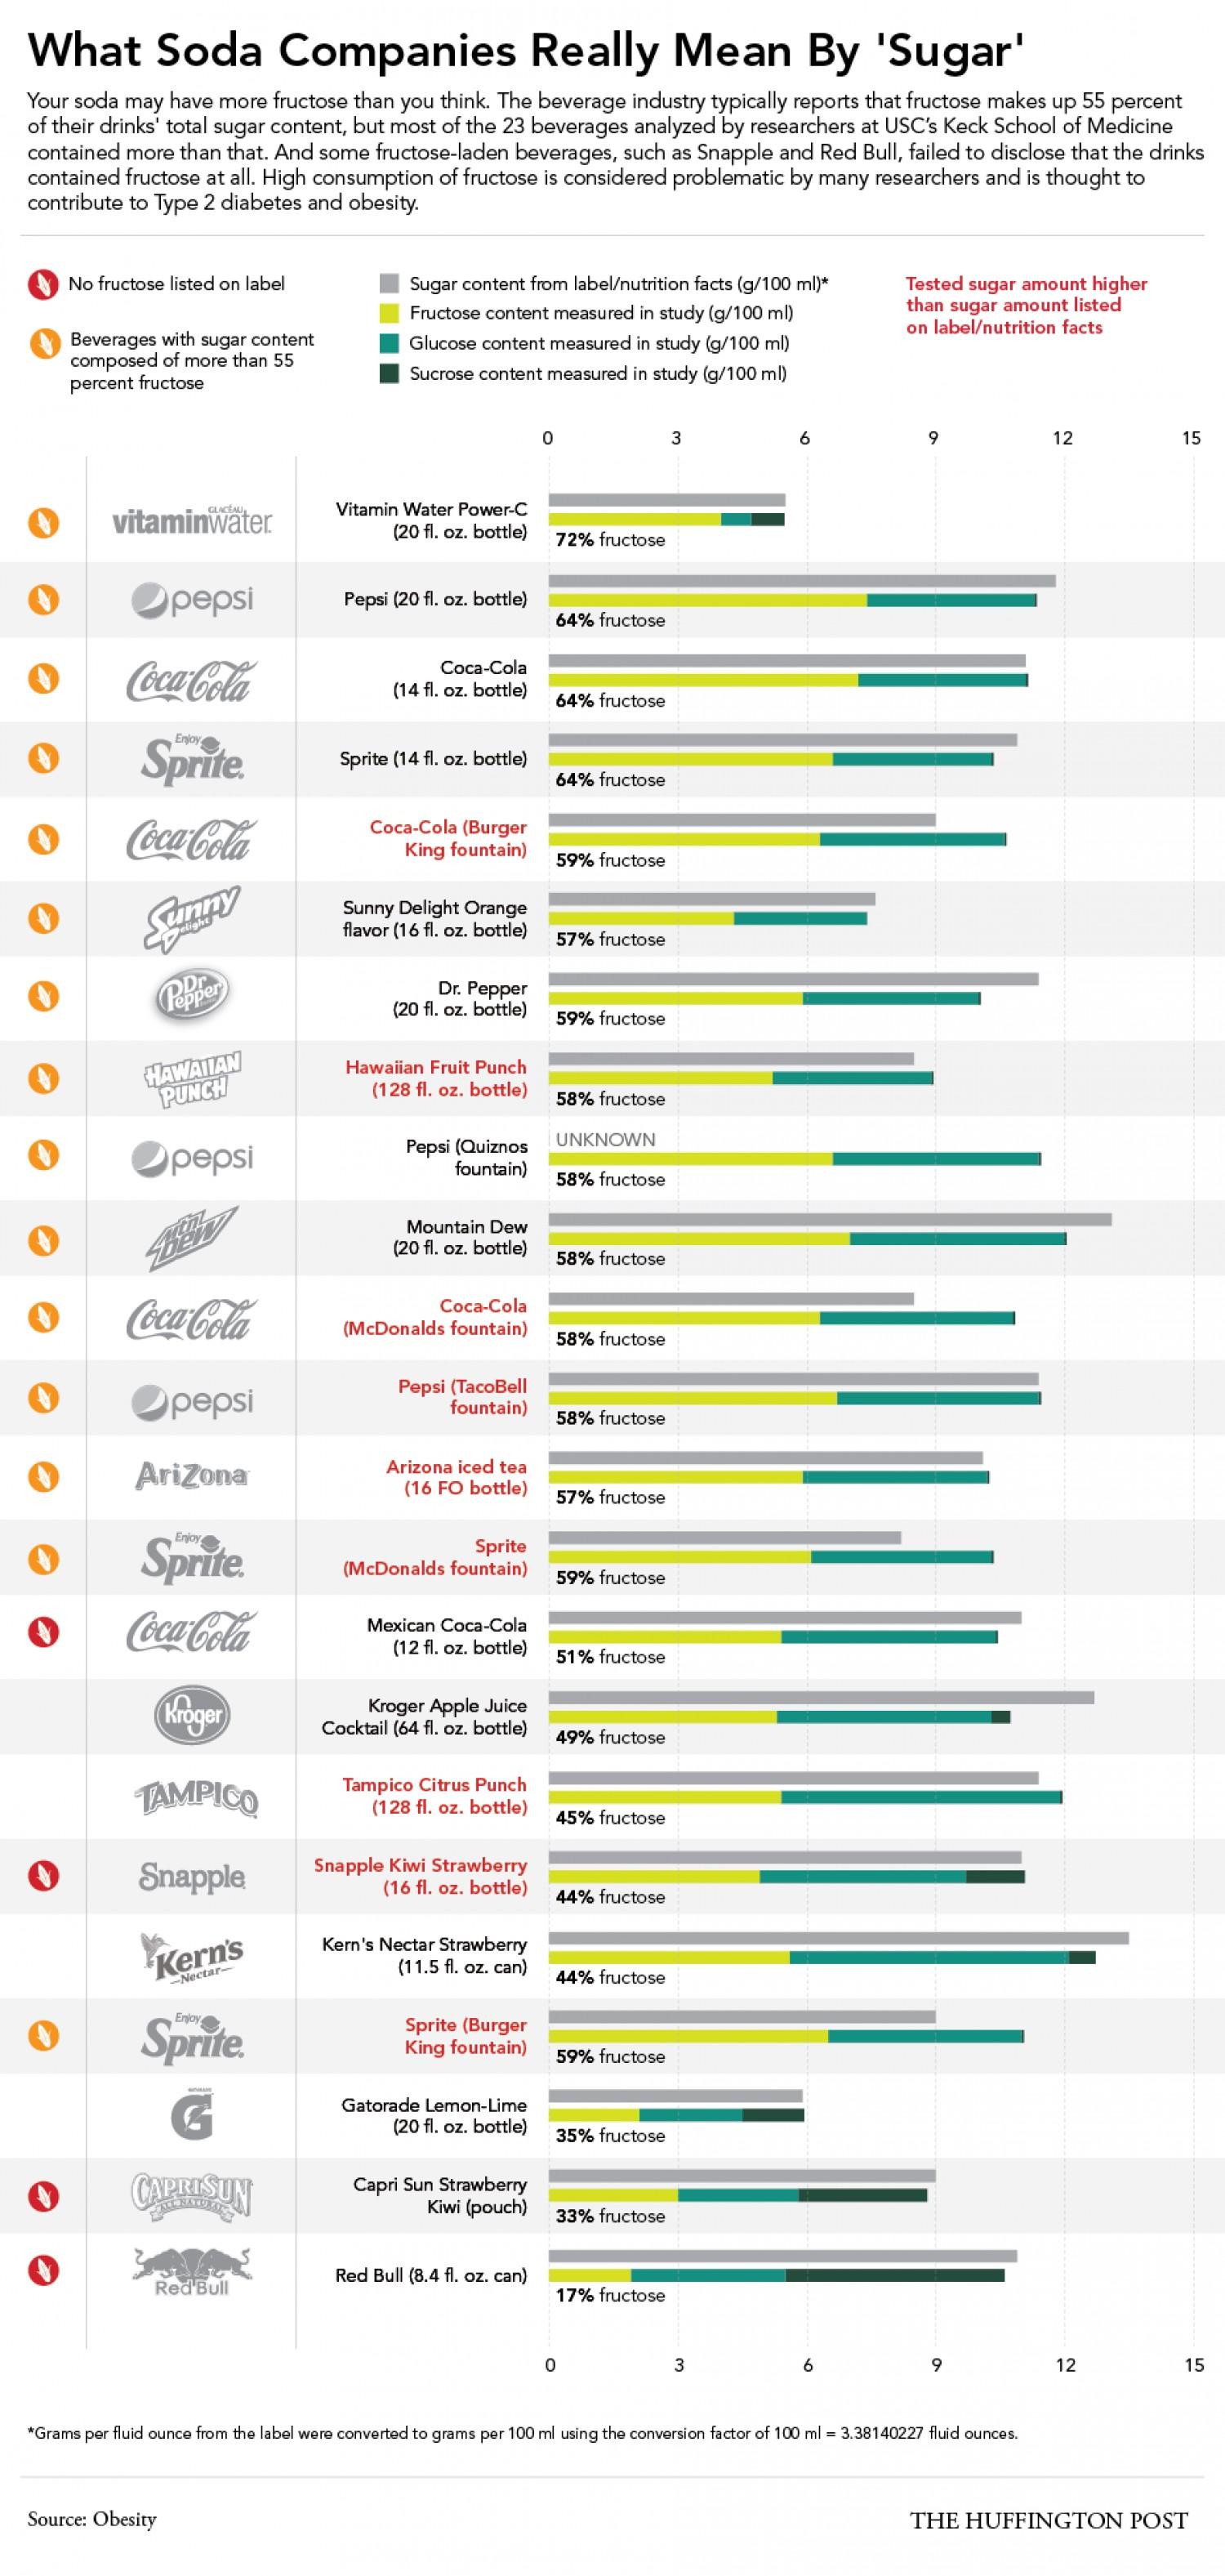 what-soda-companies-really-mean-by-sugar_53977311df2a7_w1500